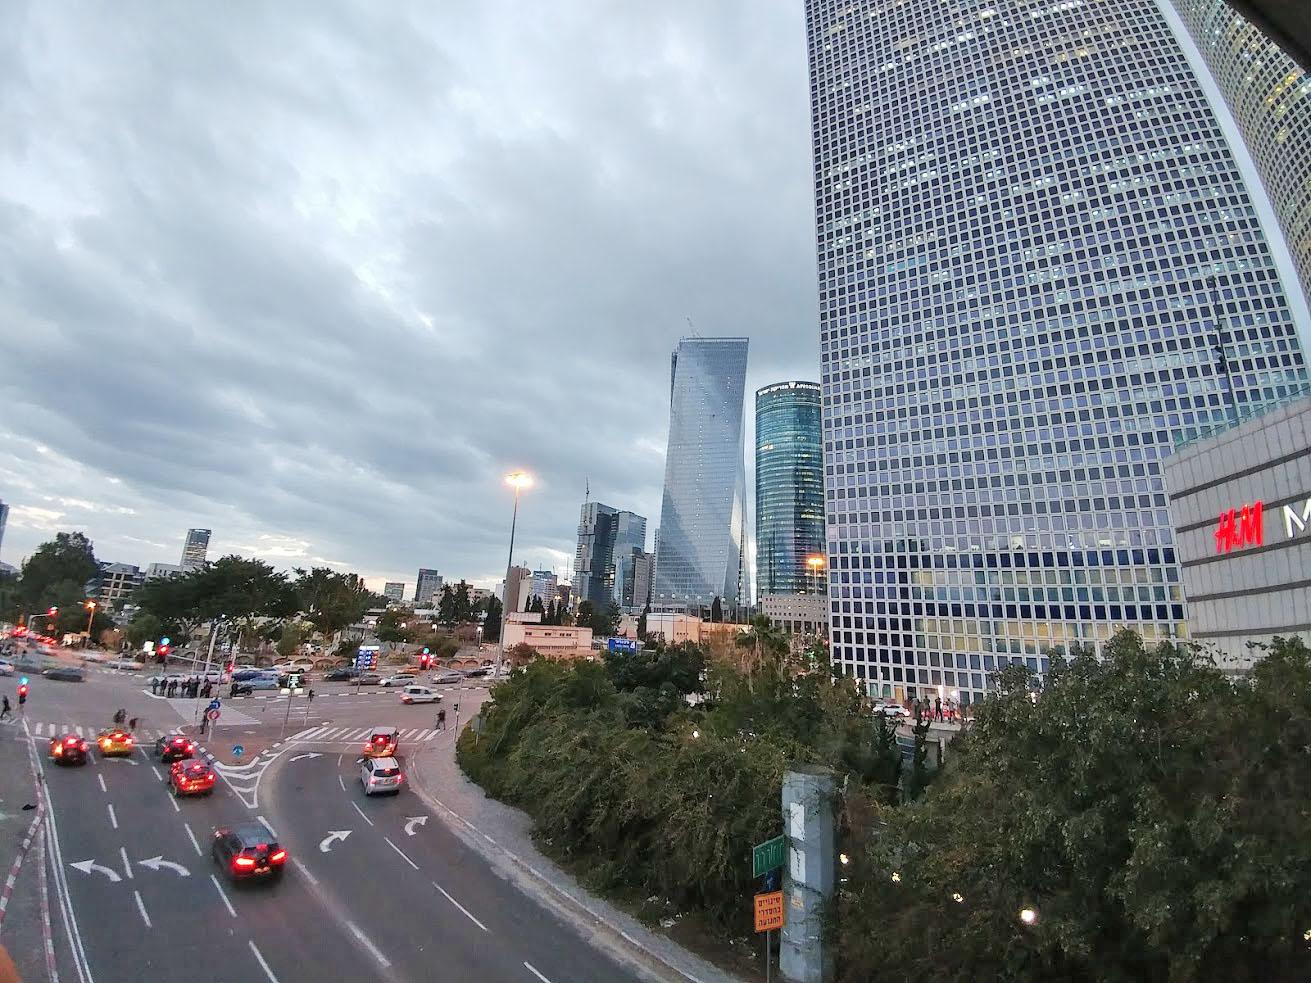 קראון פלאזה סיטי סנטר תל אביב